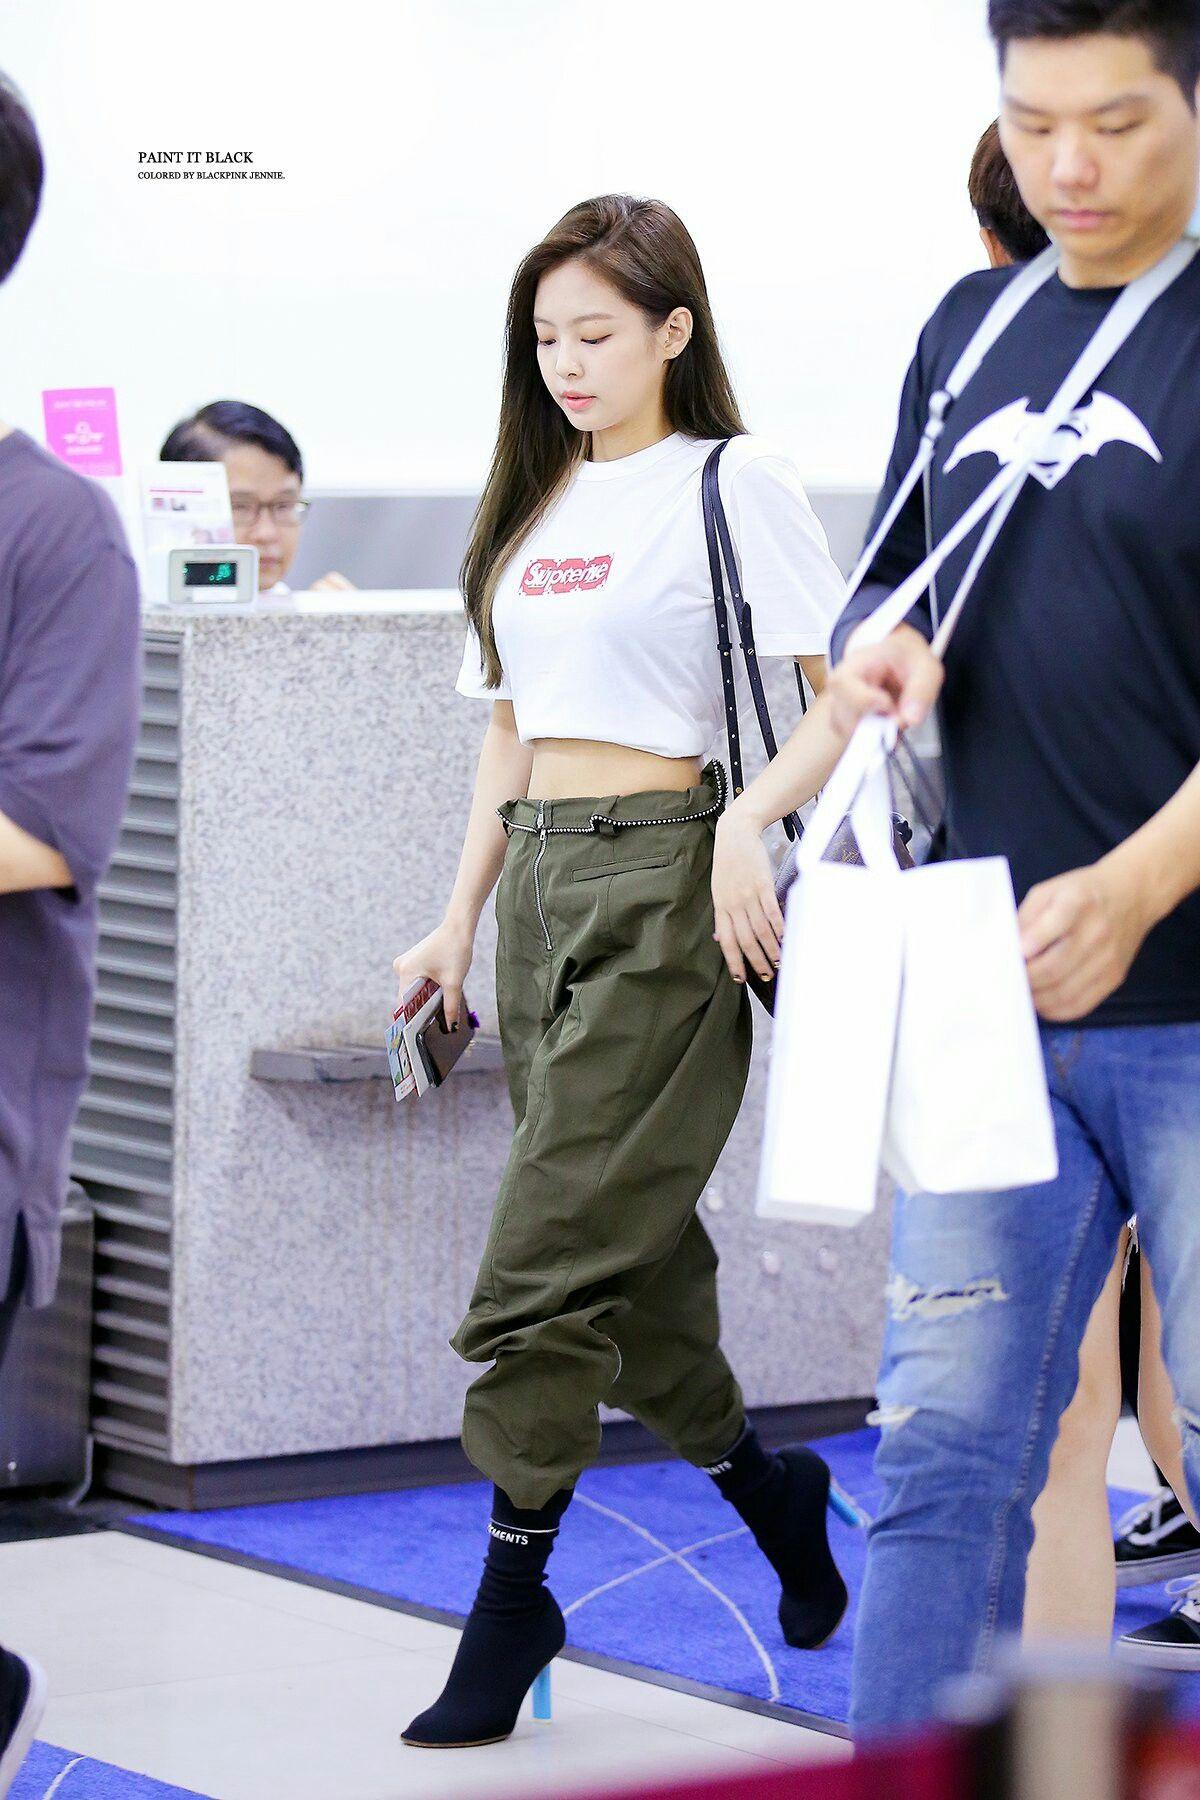 Blackpink Jennie #BLackPink #JennieKim #AirportFashion | Jennie | Pinterest | Blackpink jennie ...